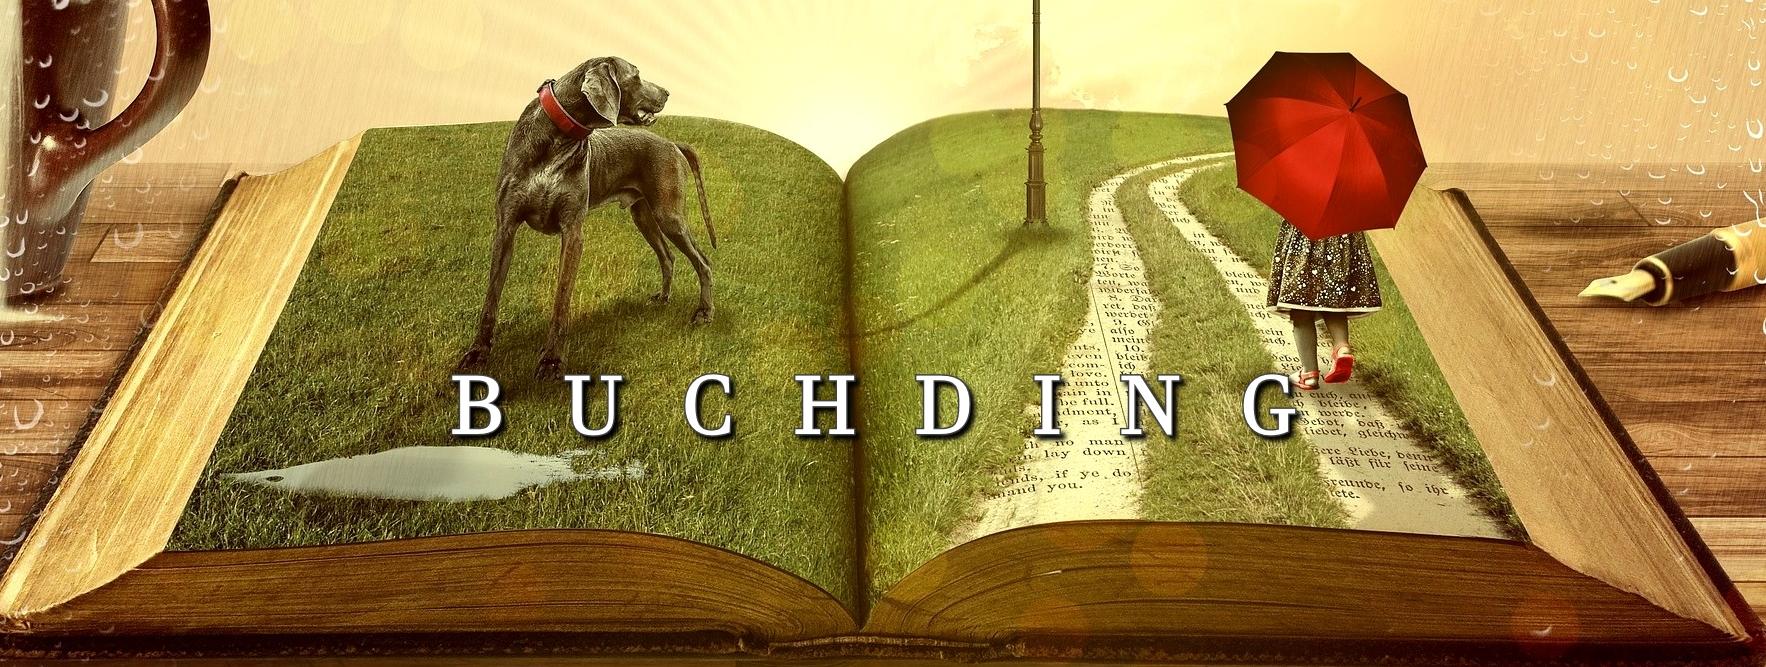 BUCHDING